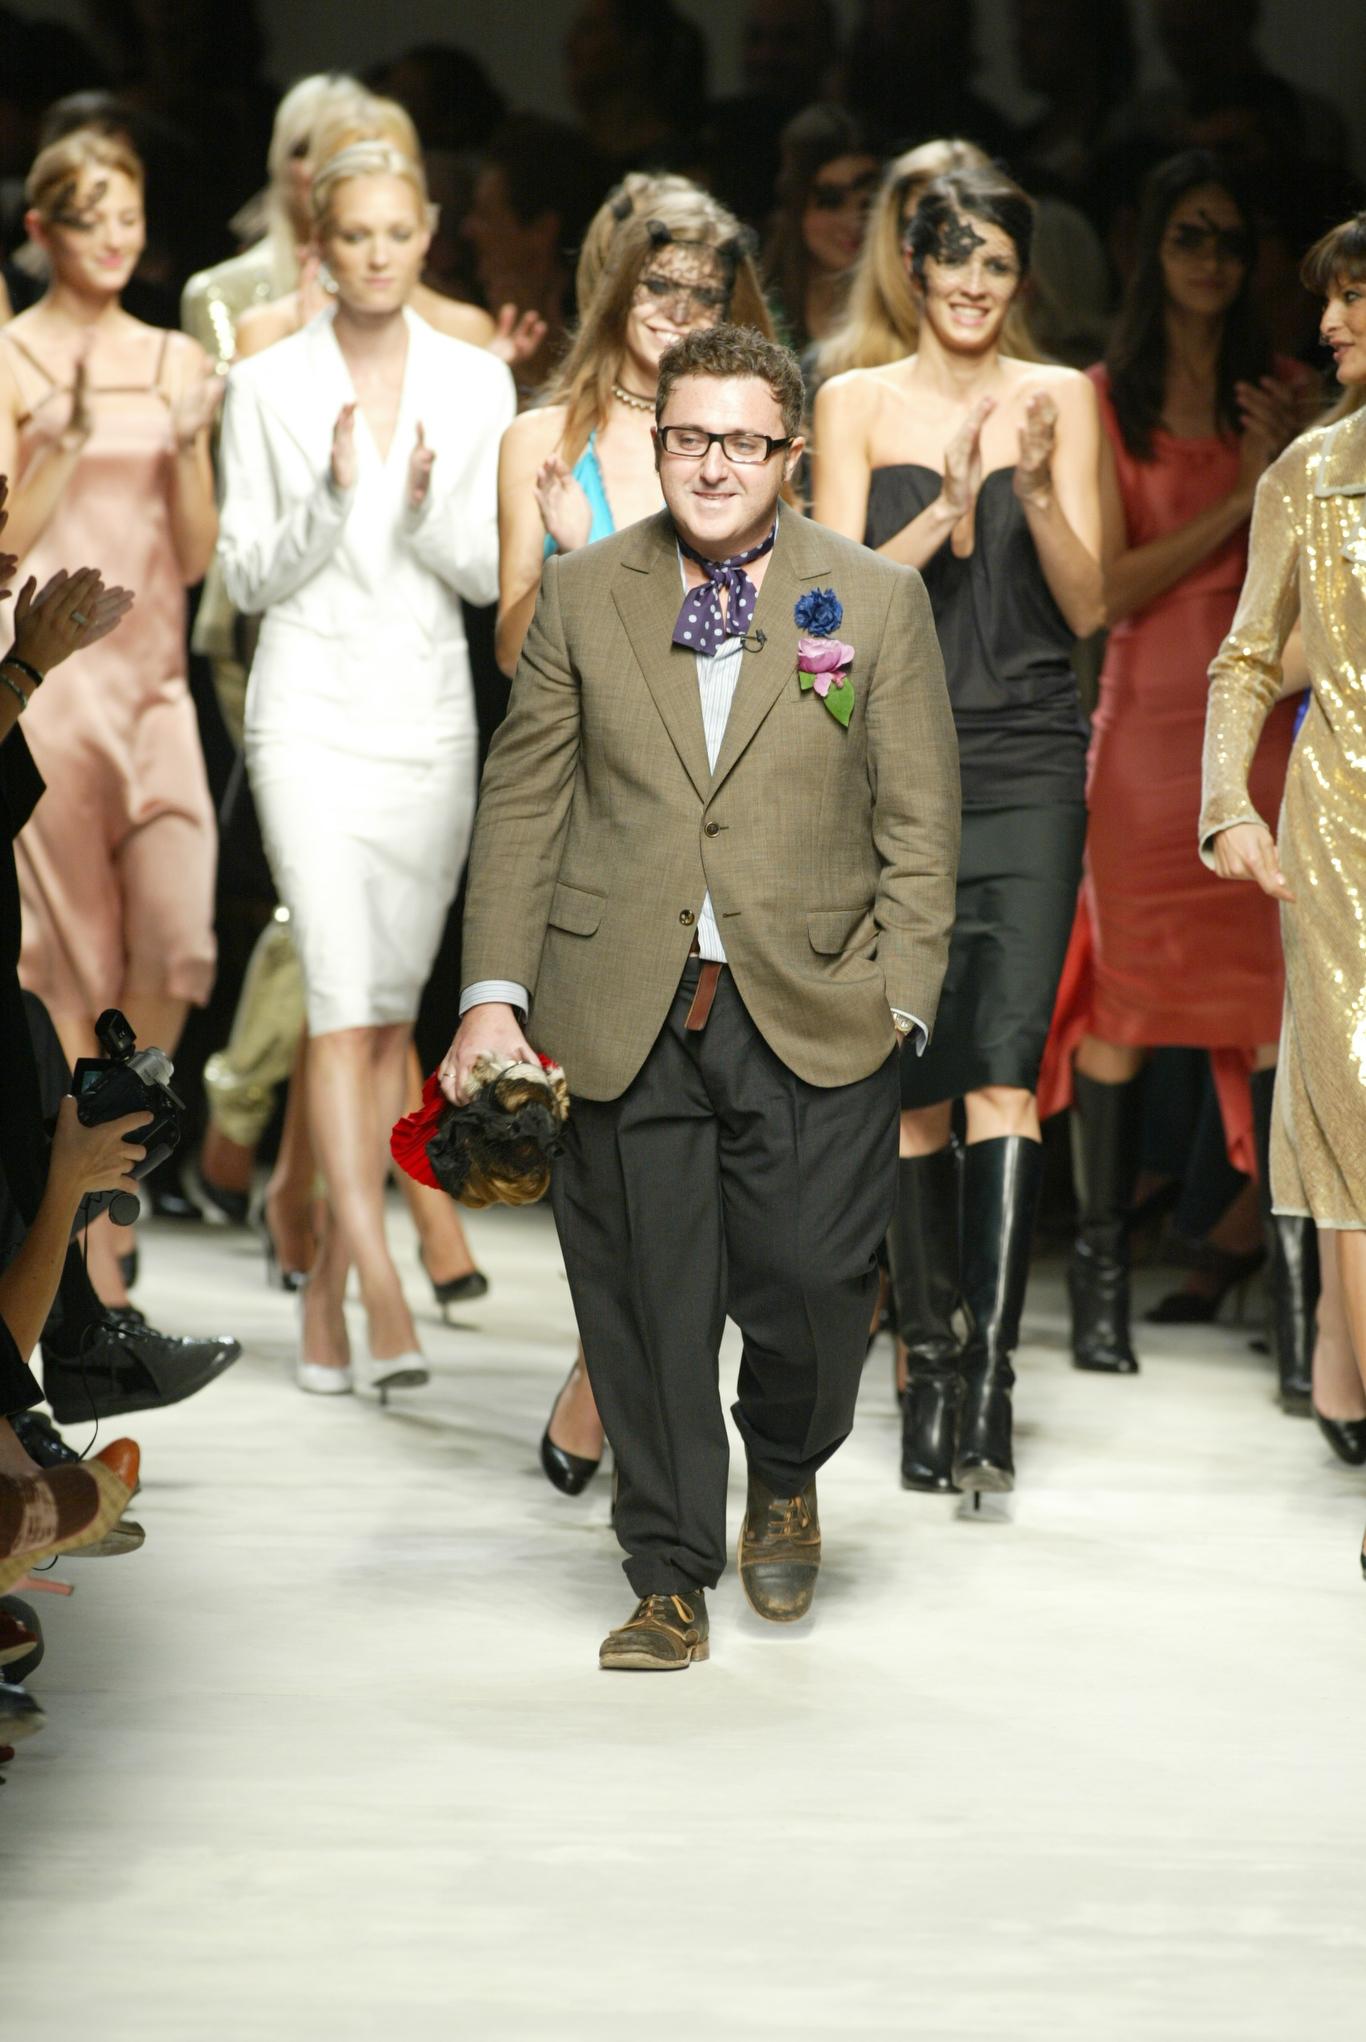 Designer Alber Elbaz walks down the runway at the Spring 2004 Lanvin show in Paris.